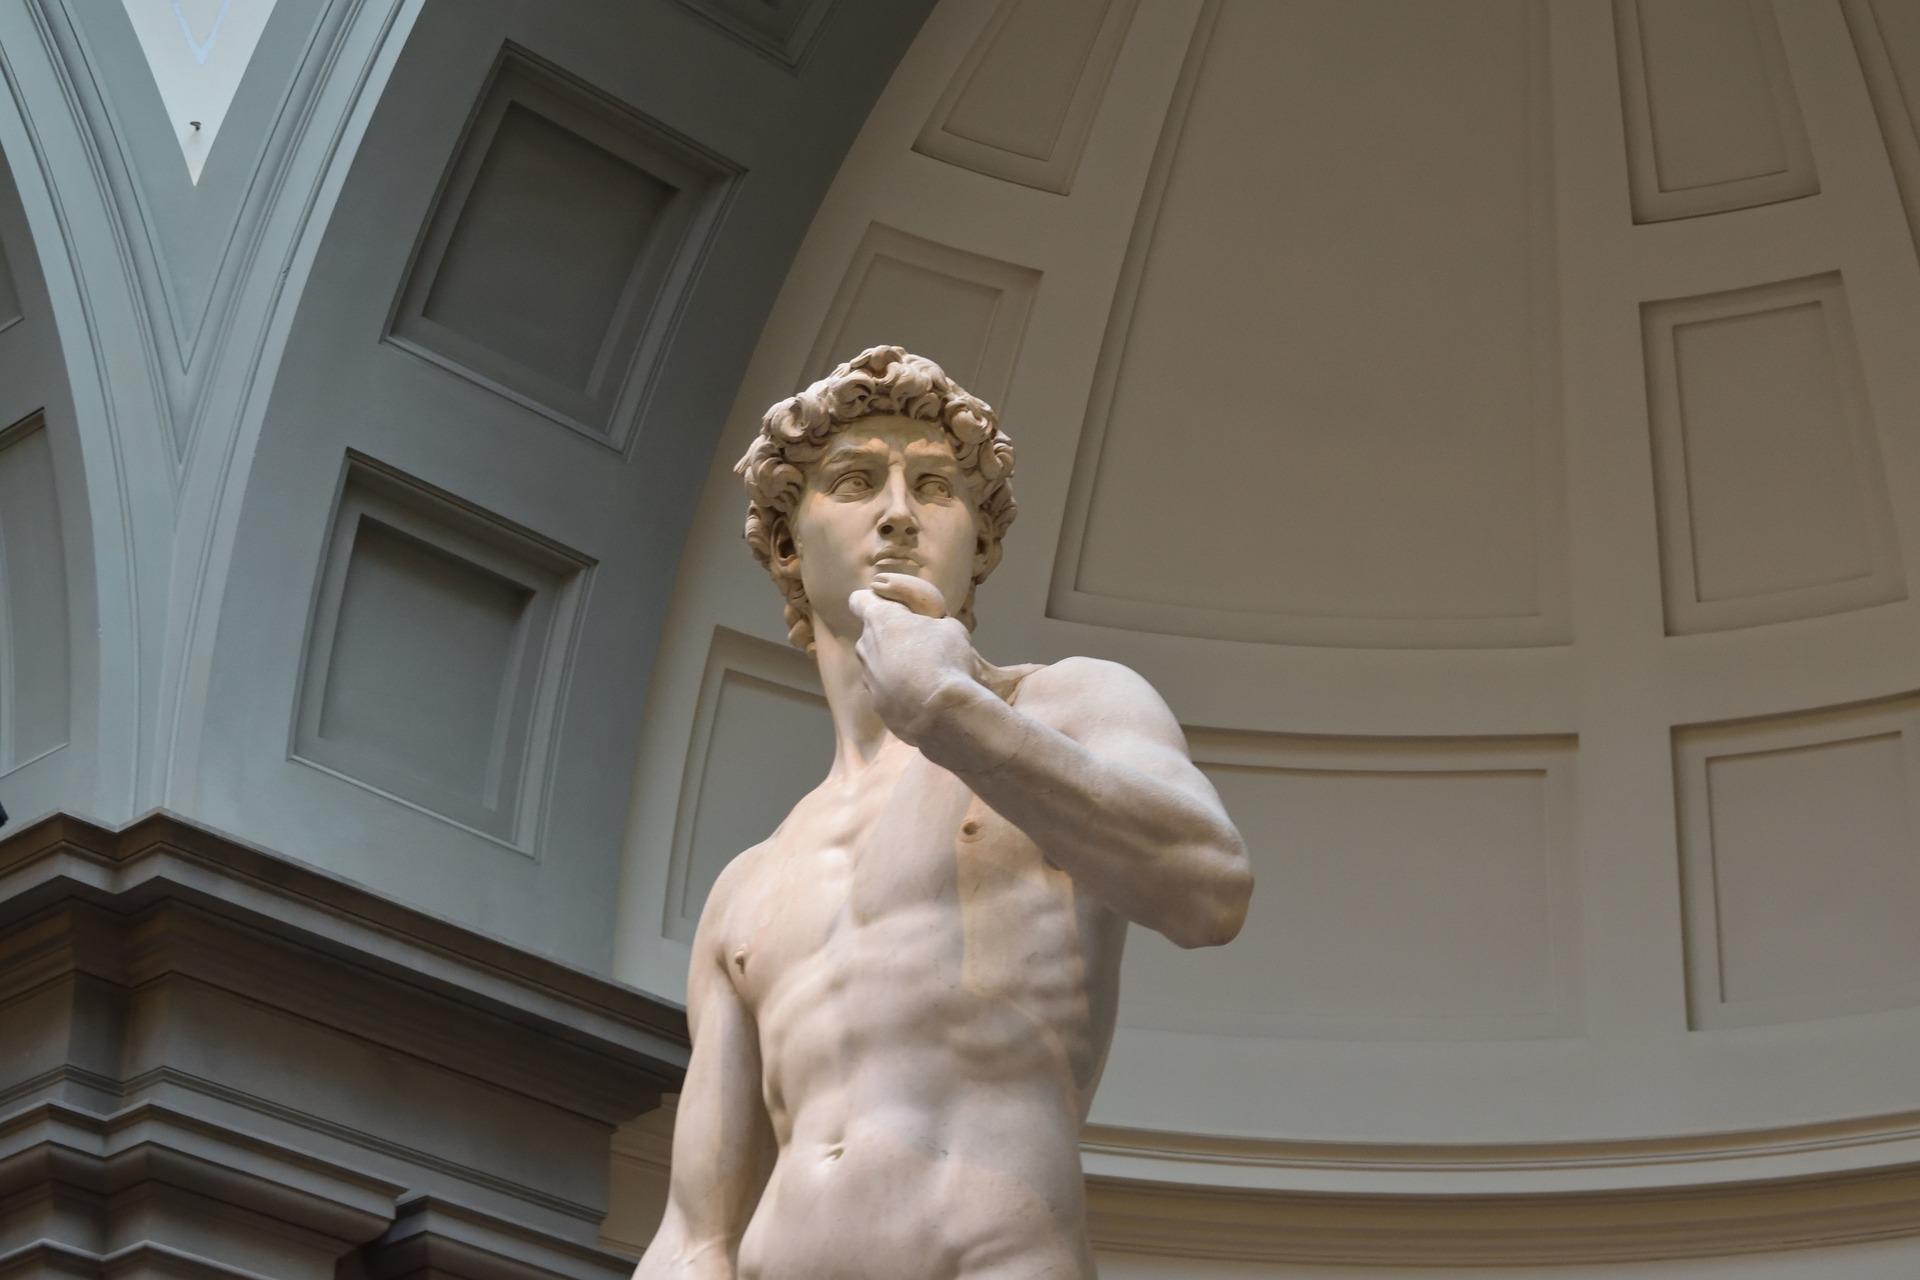 Italian art, sculpture of David